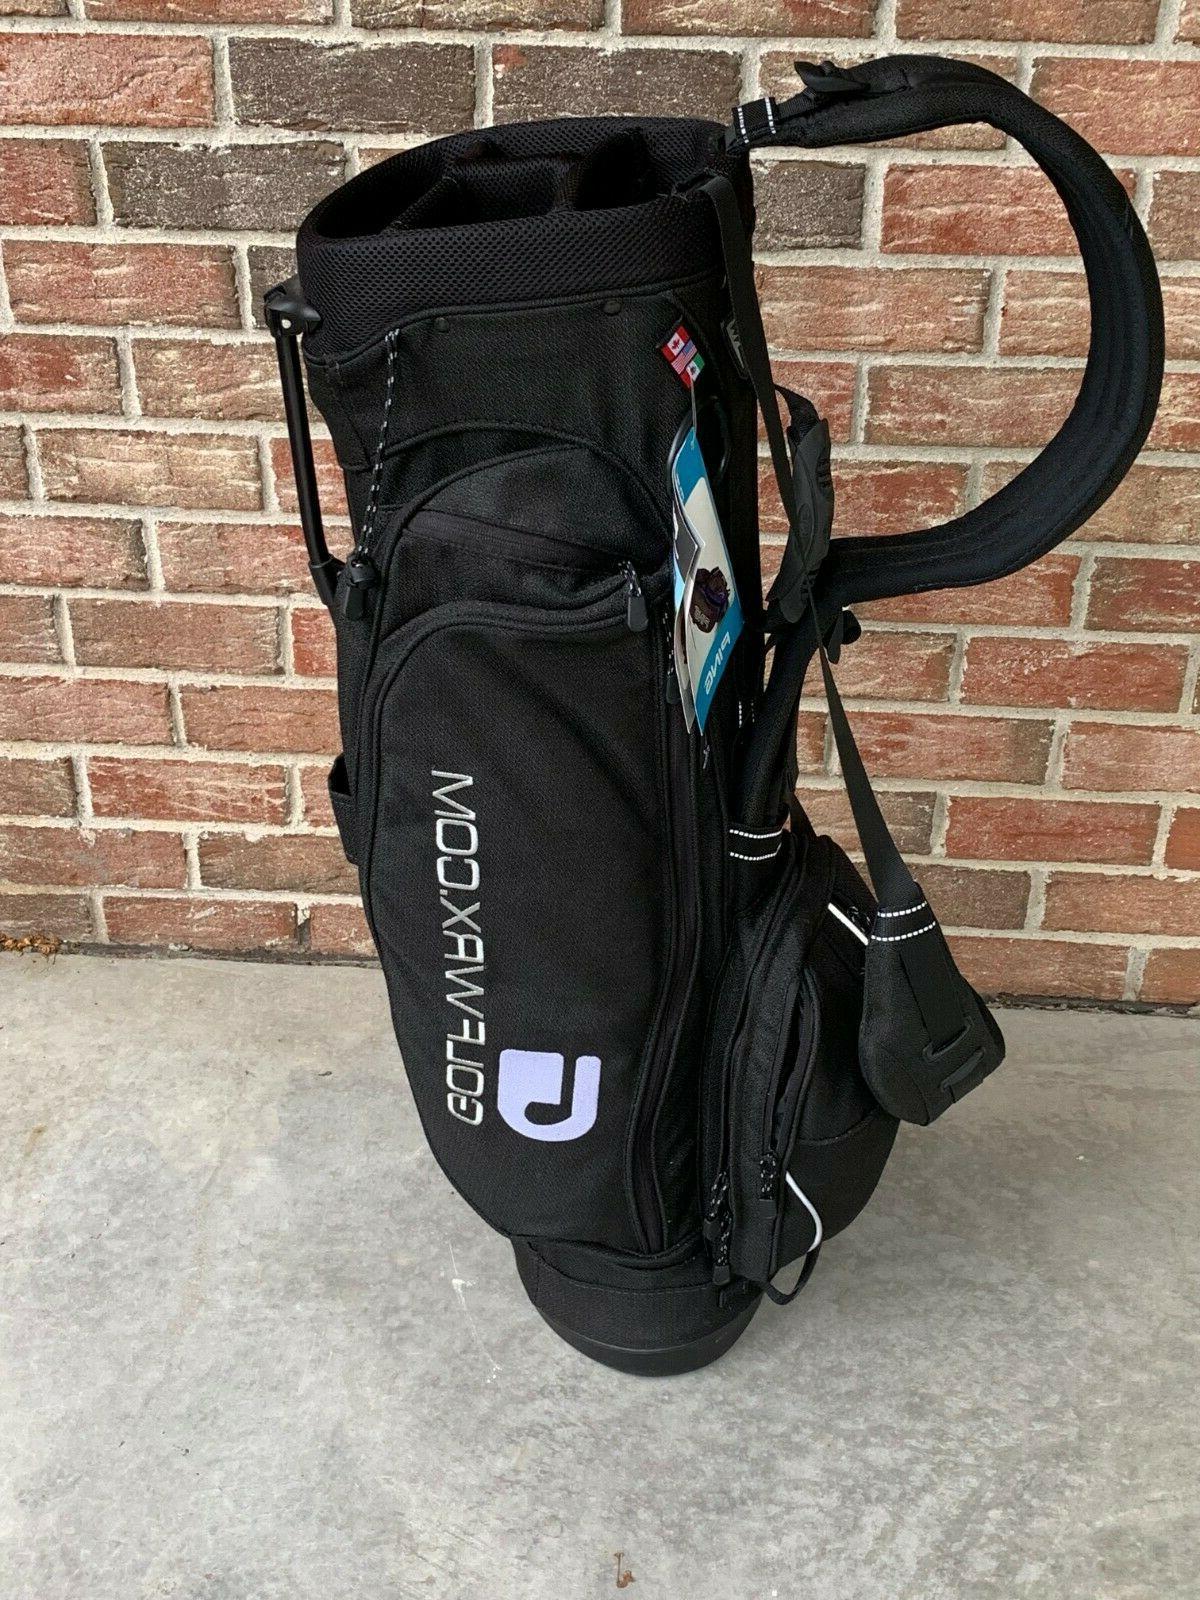 hoofer extreme carry bag brand new golfwrx